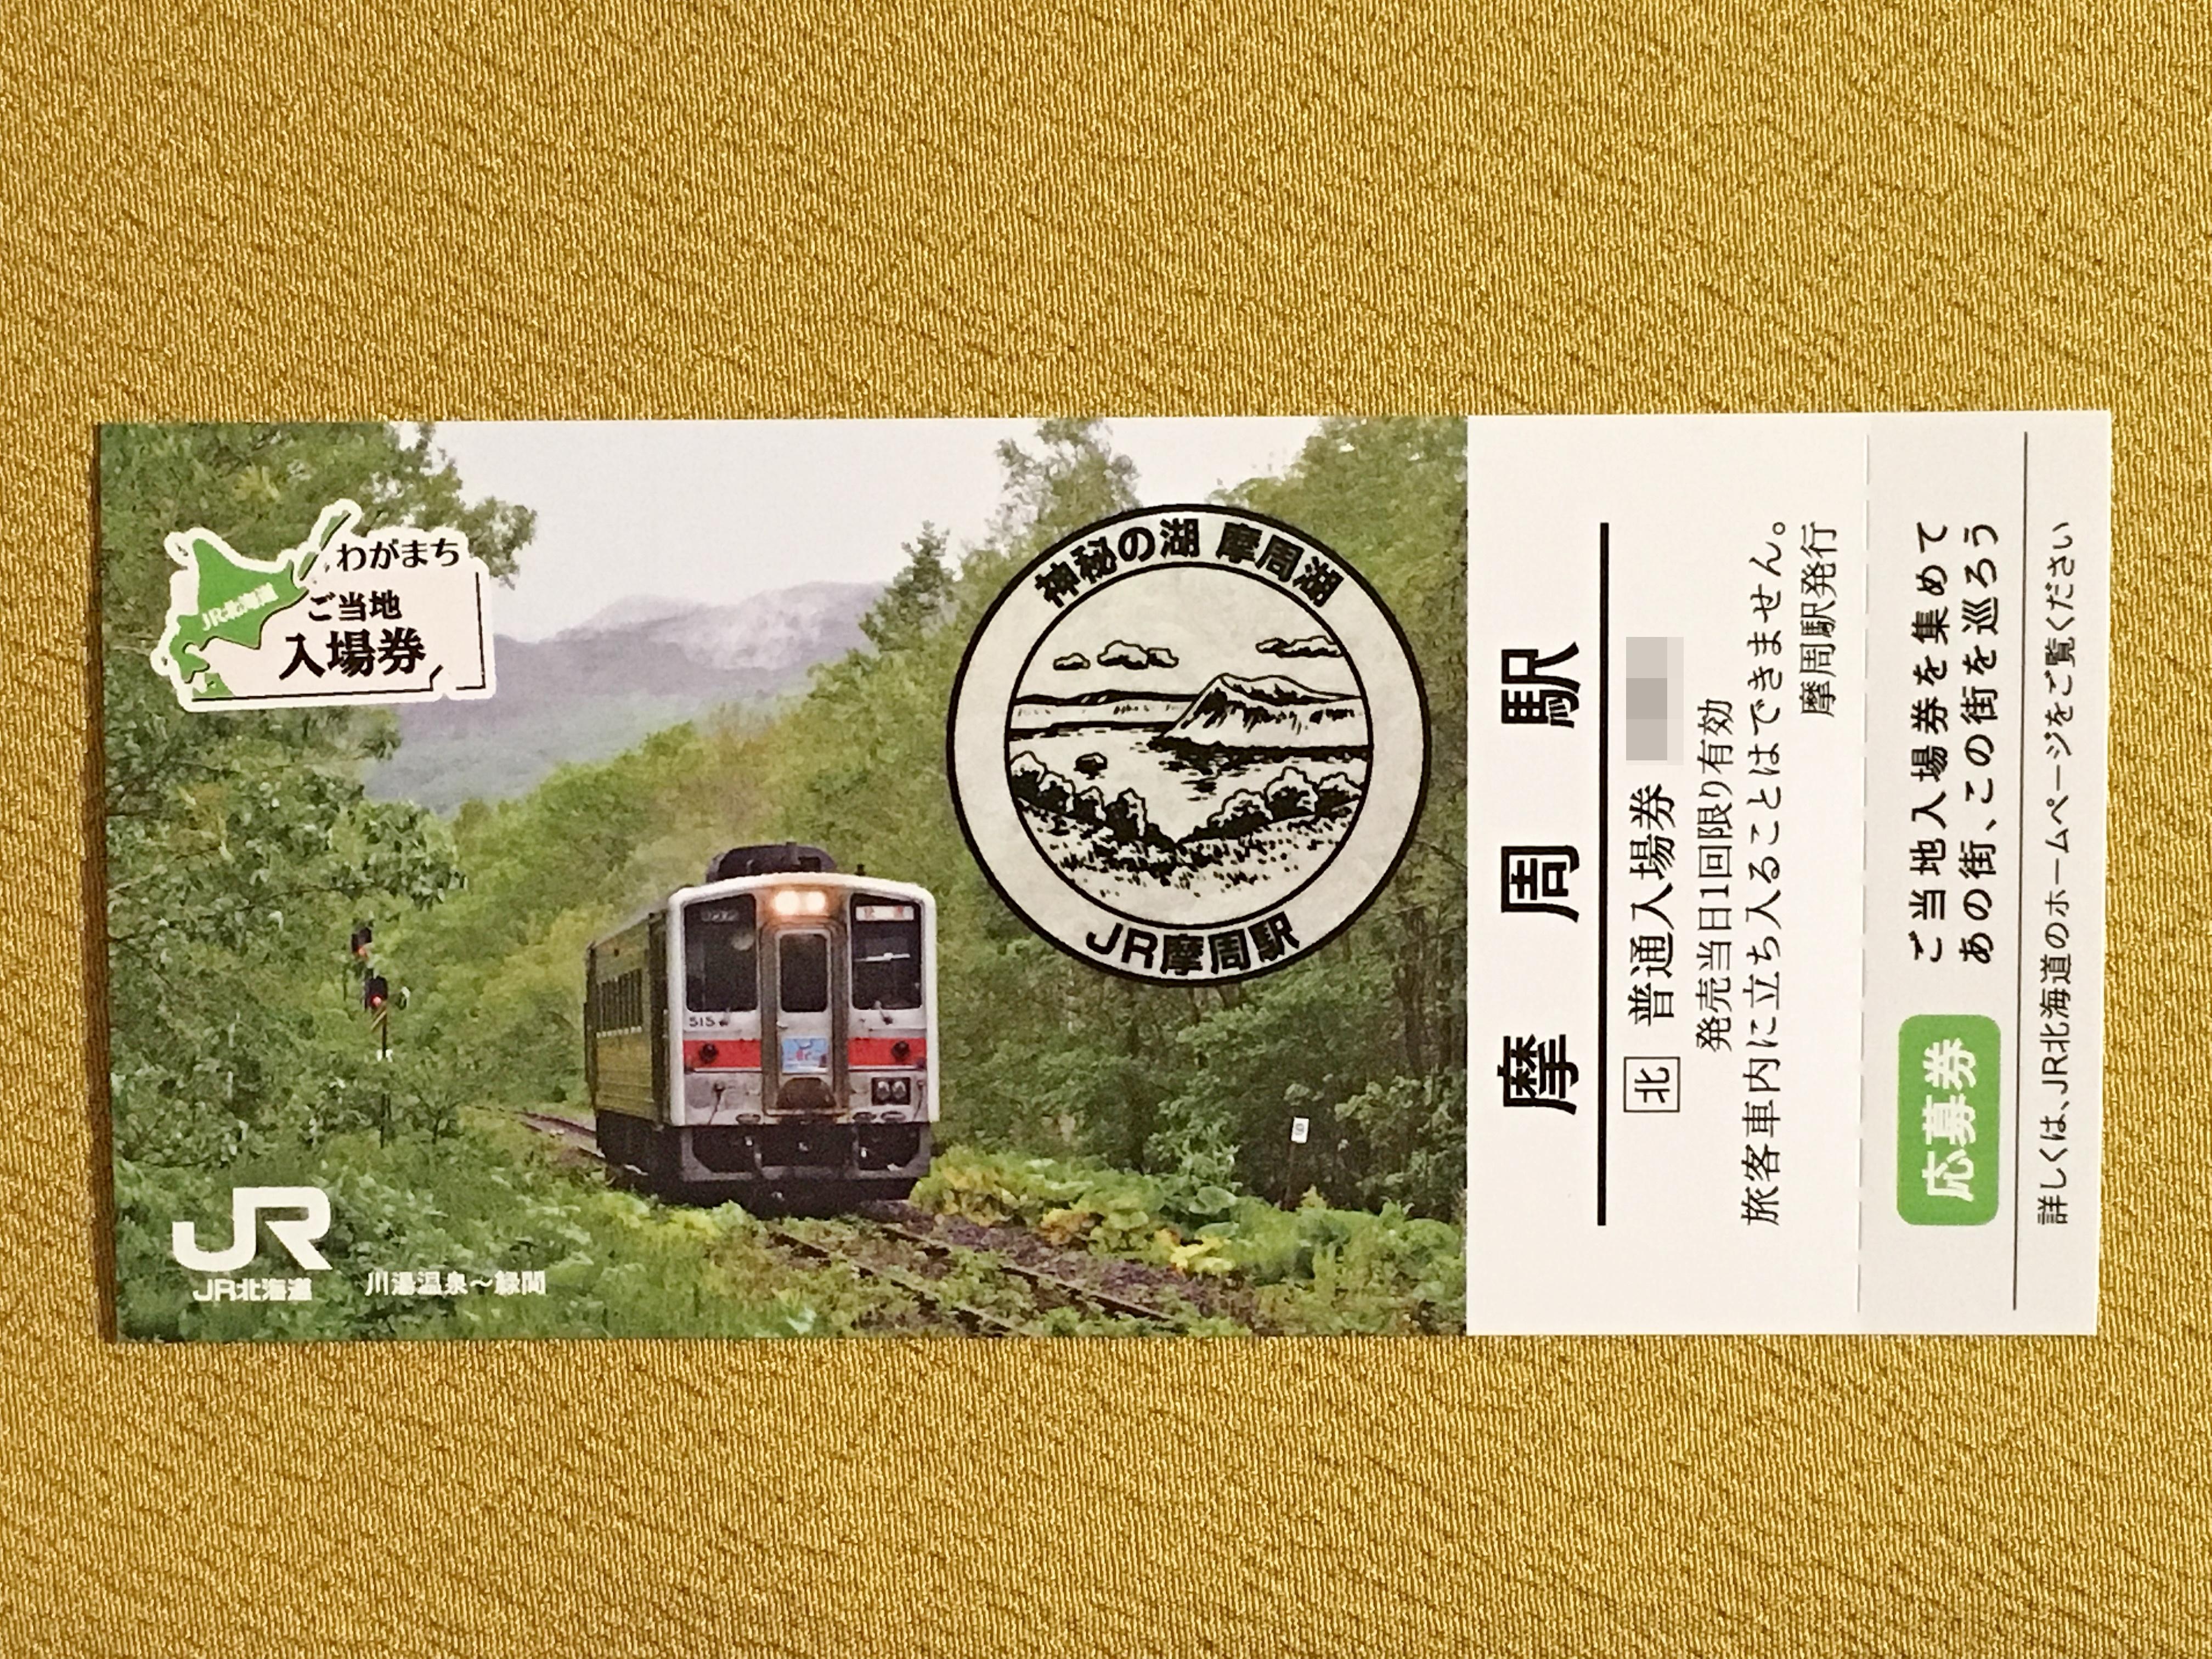 JR北海道ご当地入場券  摩周駅表.JPG